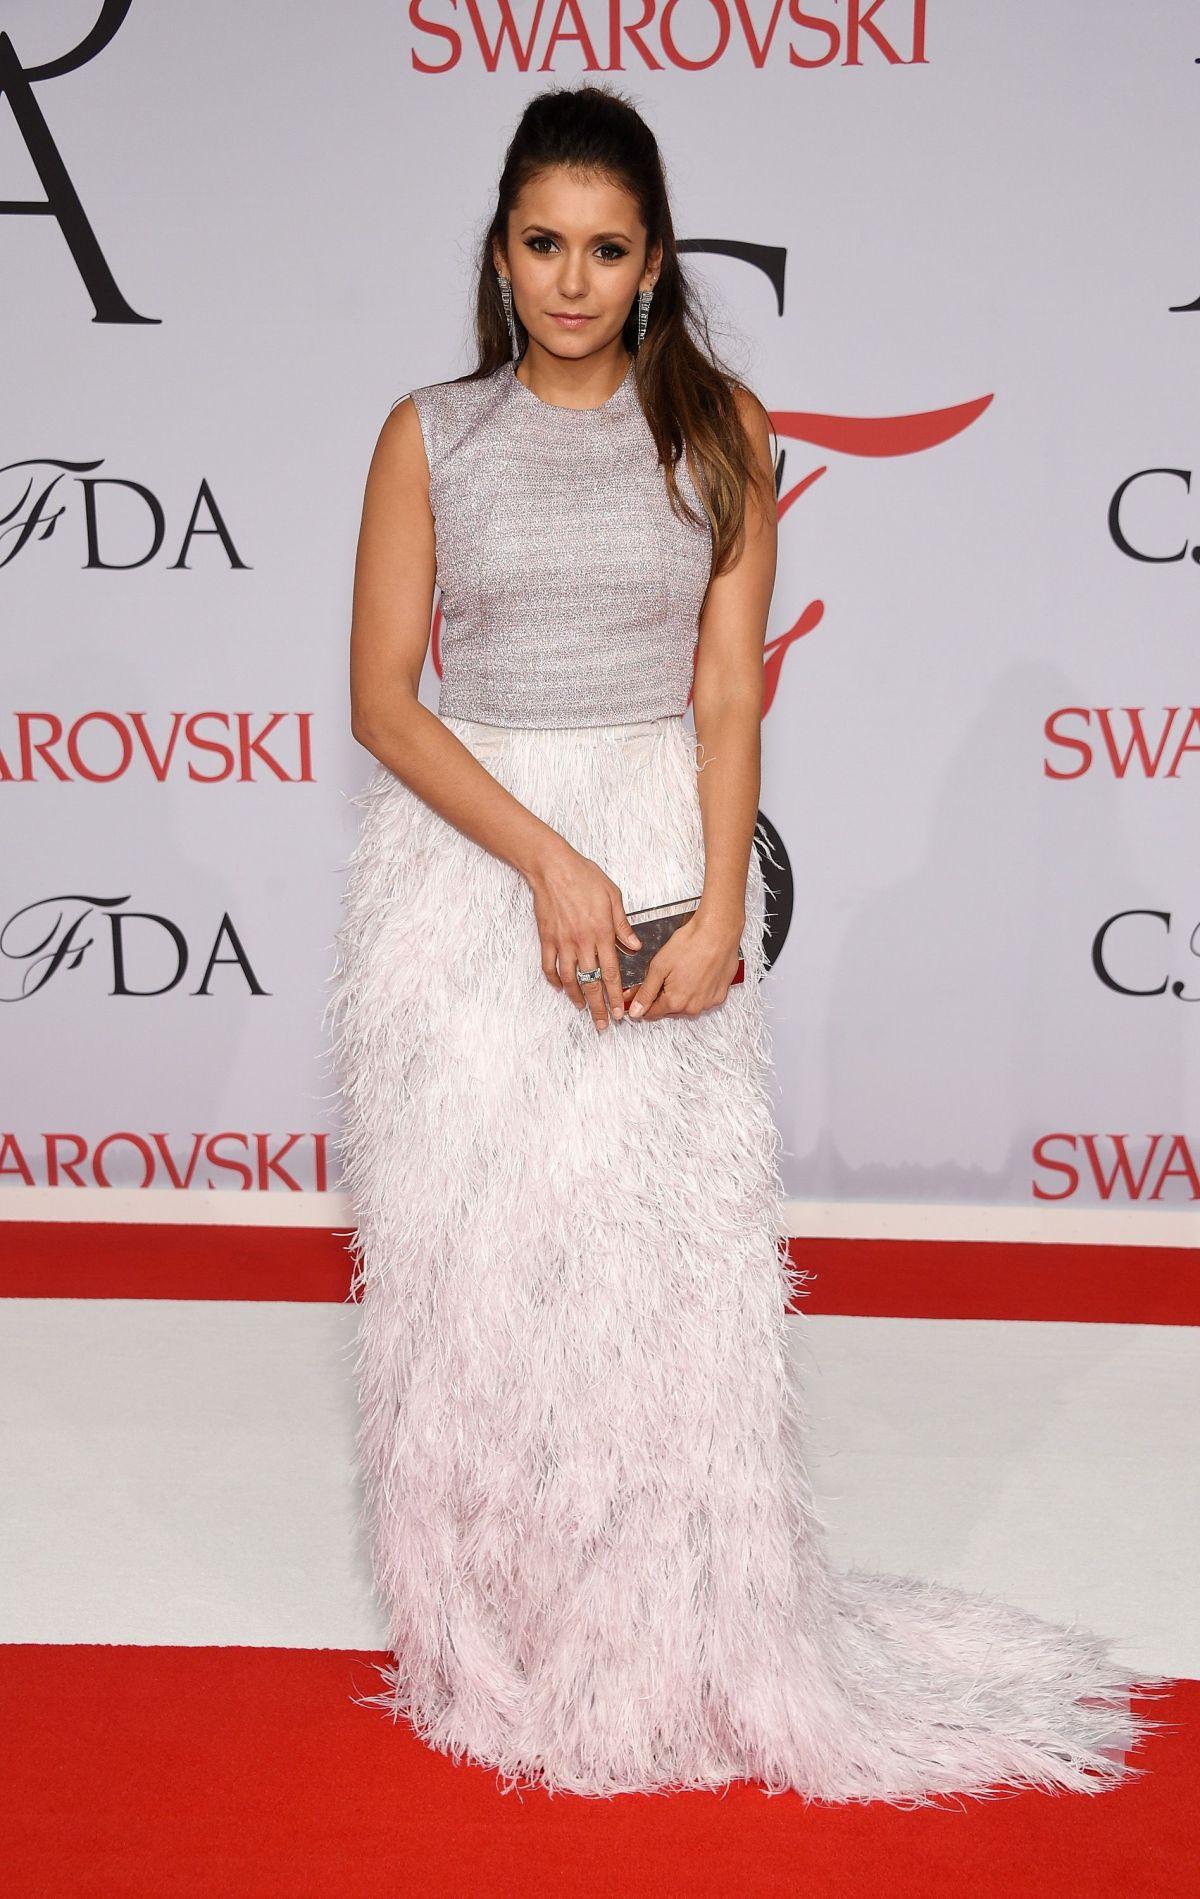 NINA DOBREV at CFDA Fashion Awards 2015 in New York